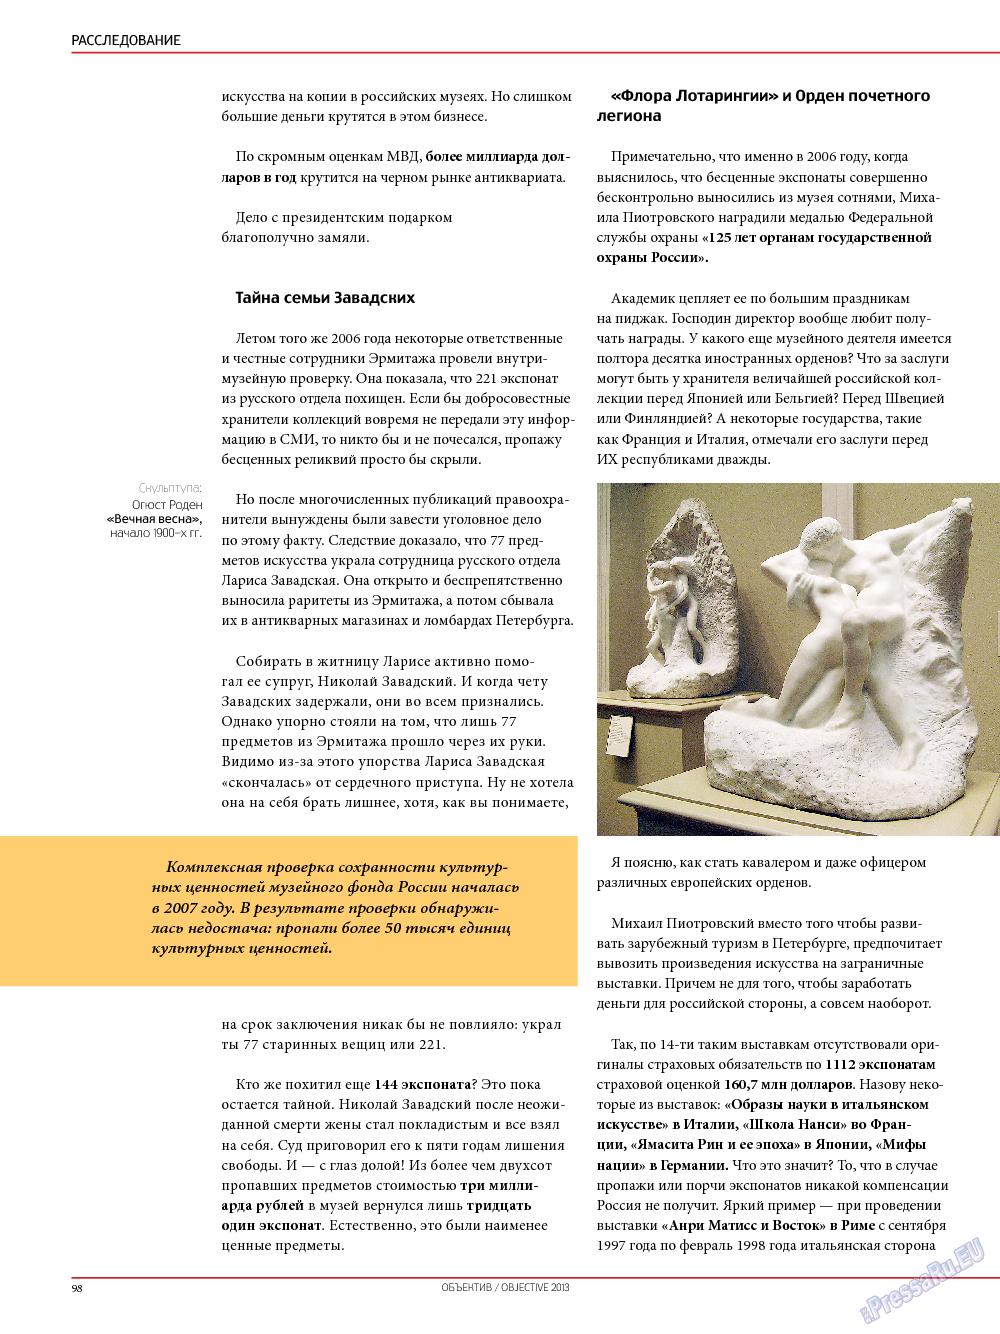 Объектив EU (журнал). 2013 год, номер 2, стр. 100